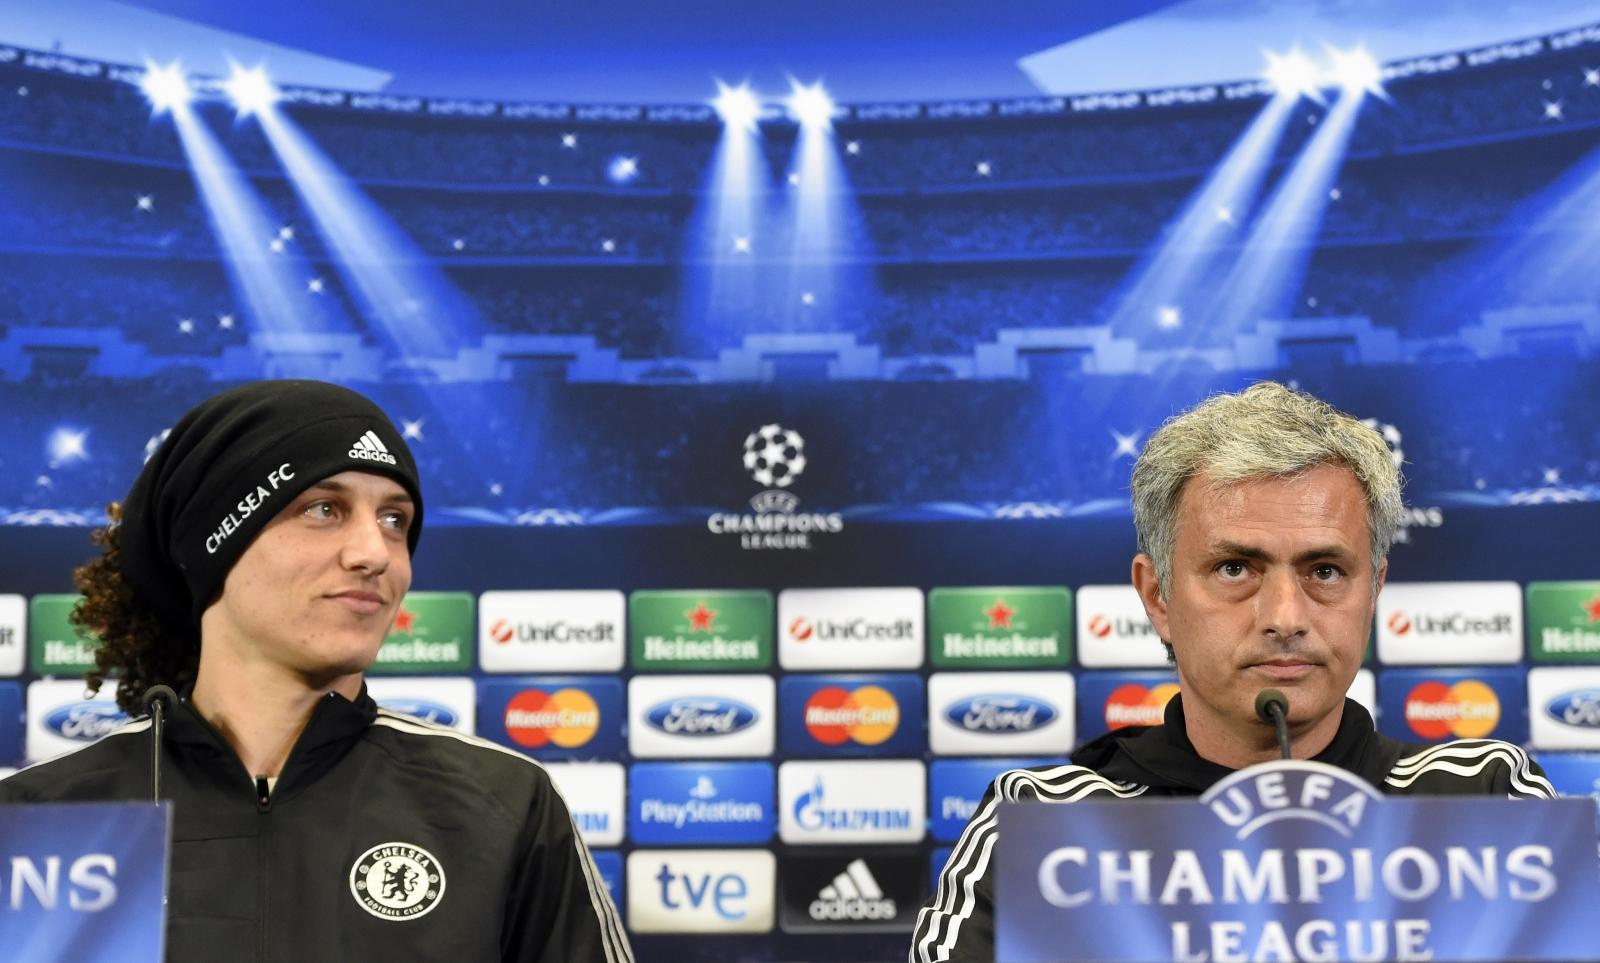 Jose Mourinho and David Luiz